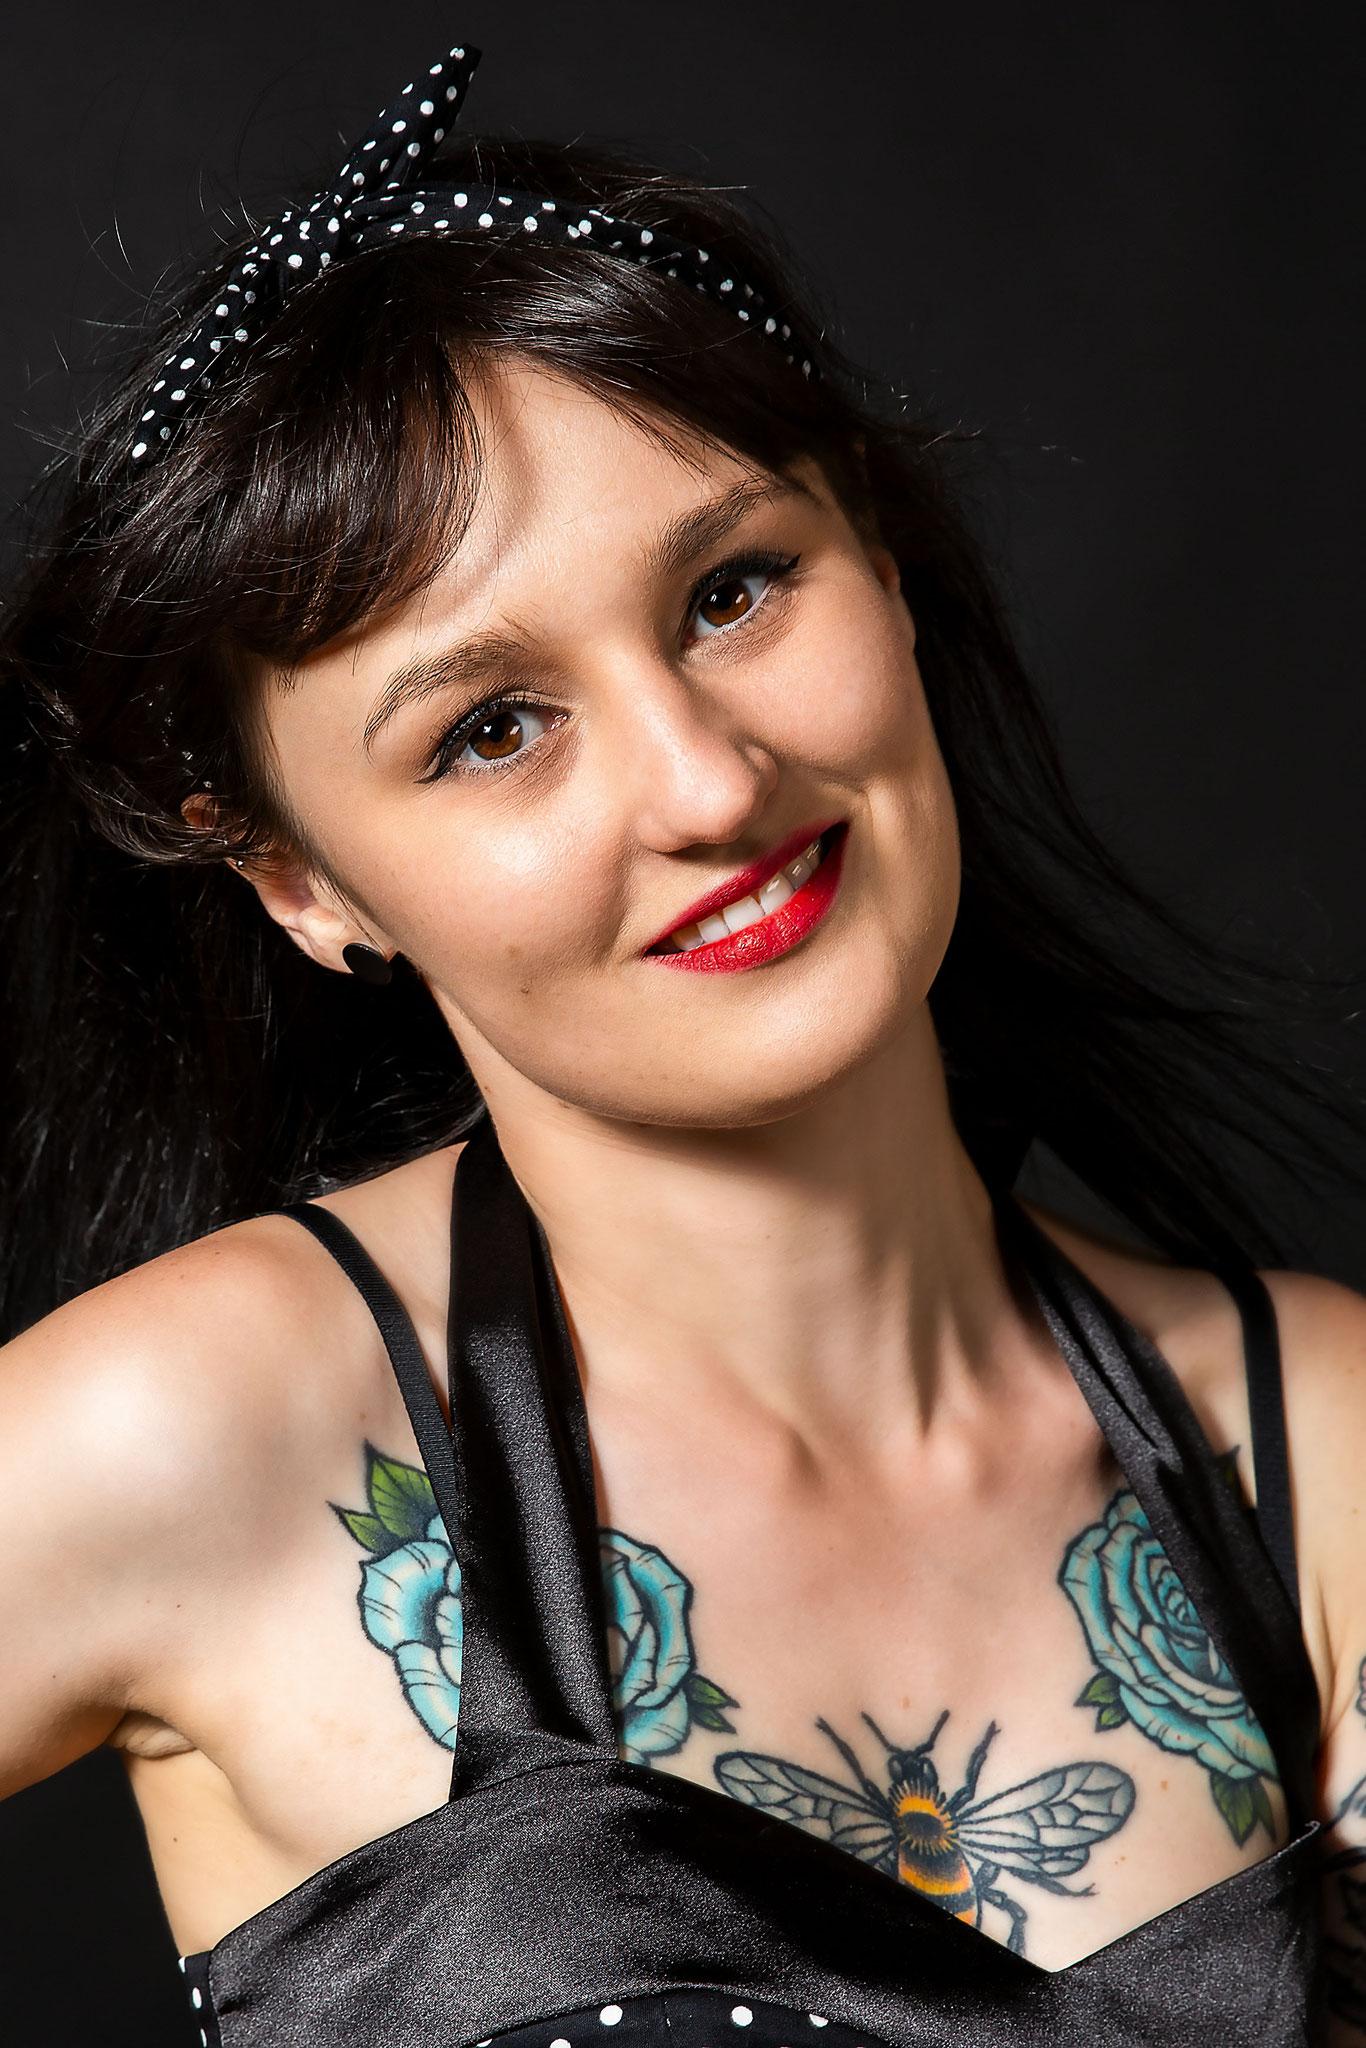 Model: Alexia